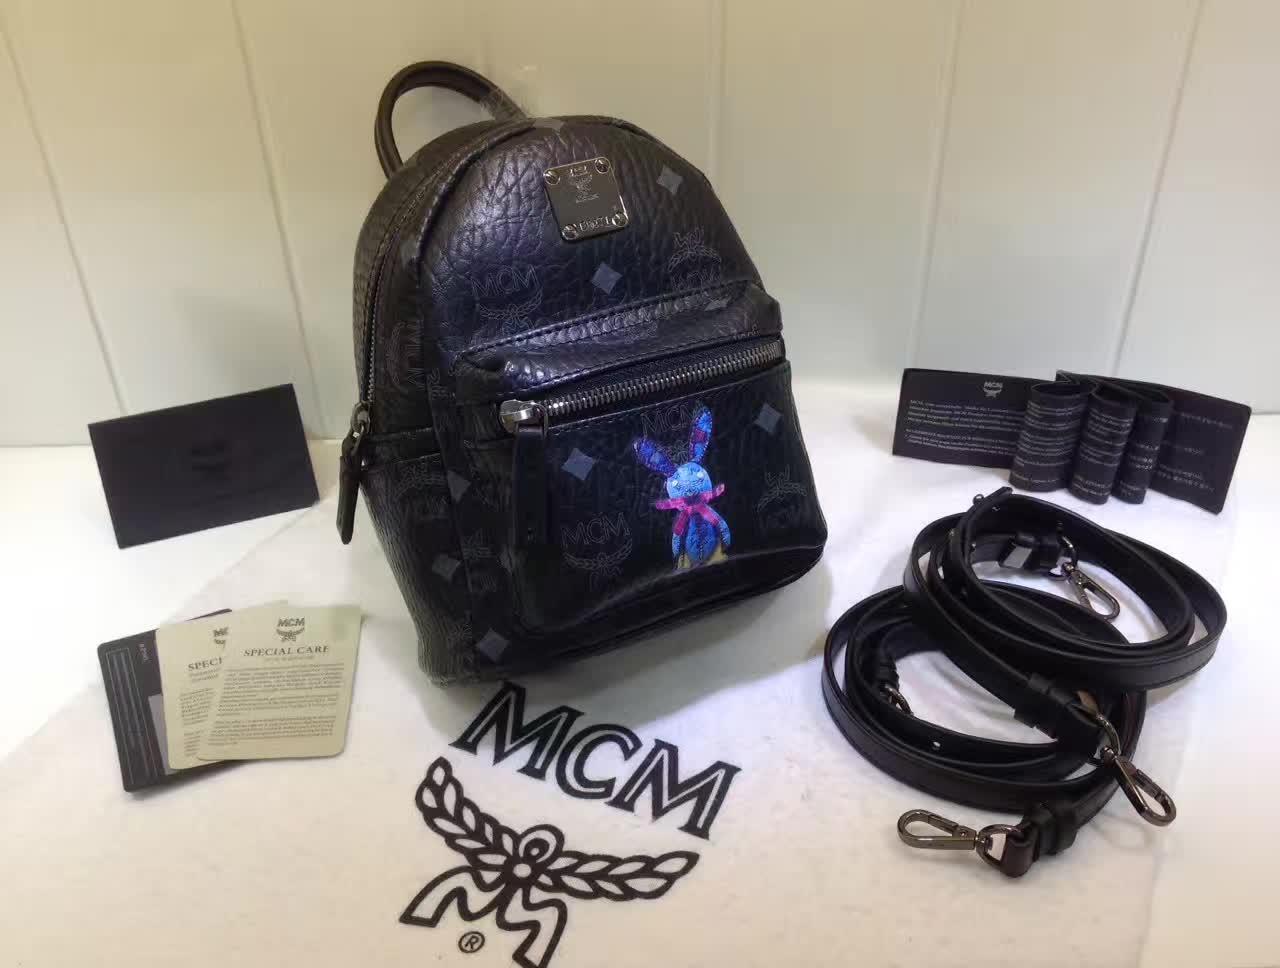 MCM韩国官网 超mini兔子背包 全新皮质纹理 内搭厚实耐用帆布 黑色